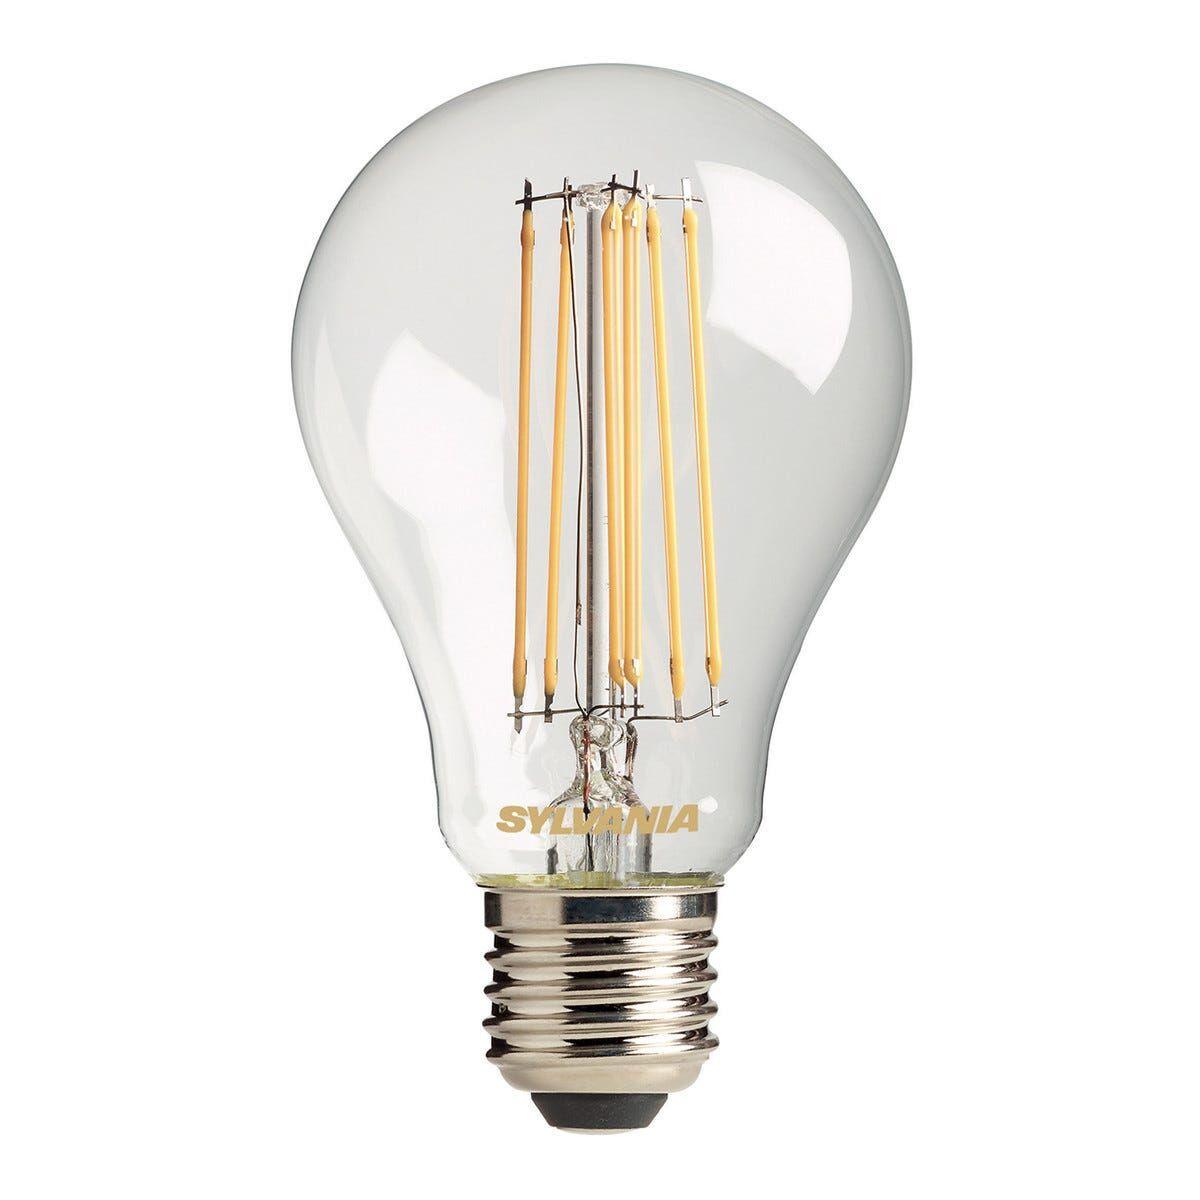 feilo_sylvania lampadina sylvania led filamento goccia e27 11w=100w 1531 lumen 2700k luce calda Ø60x104mm